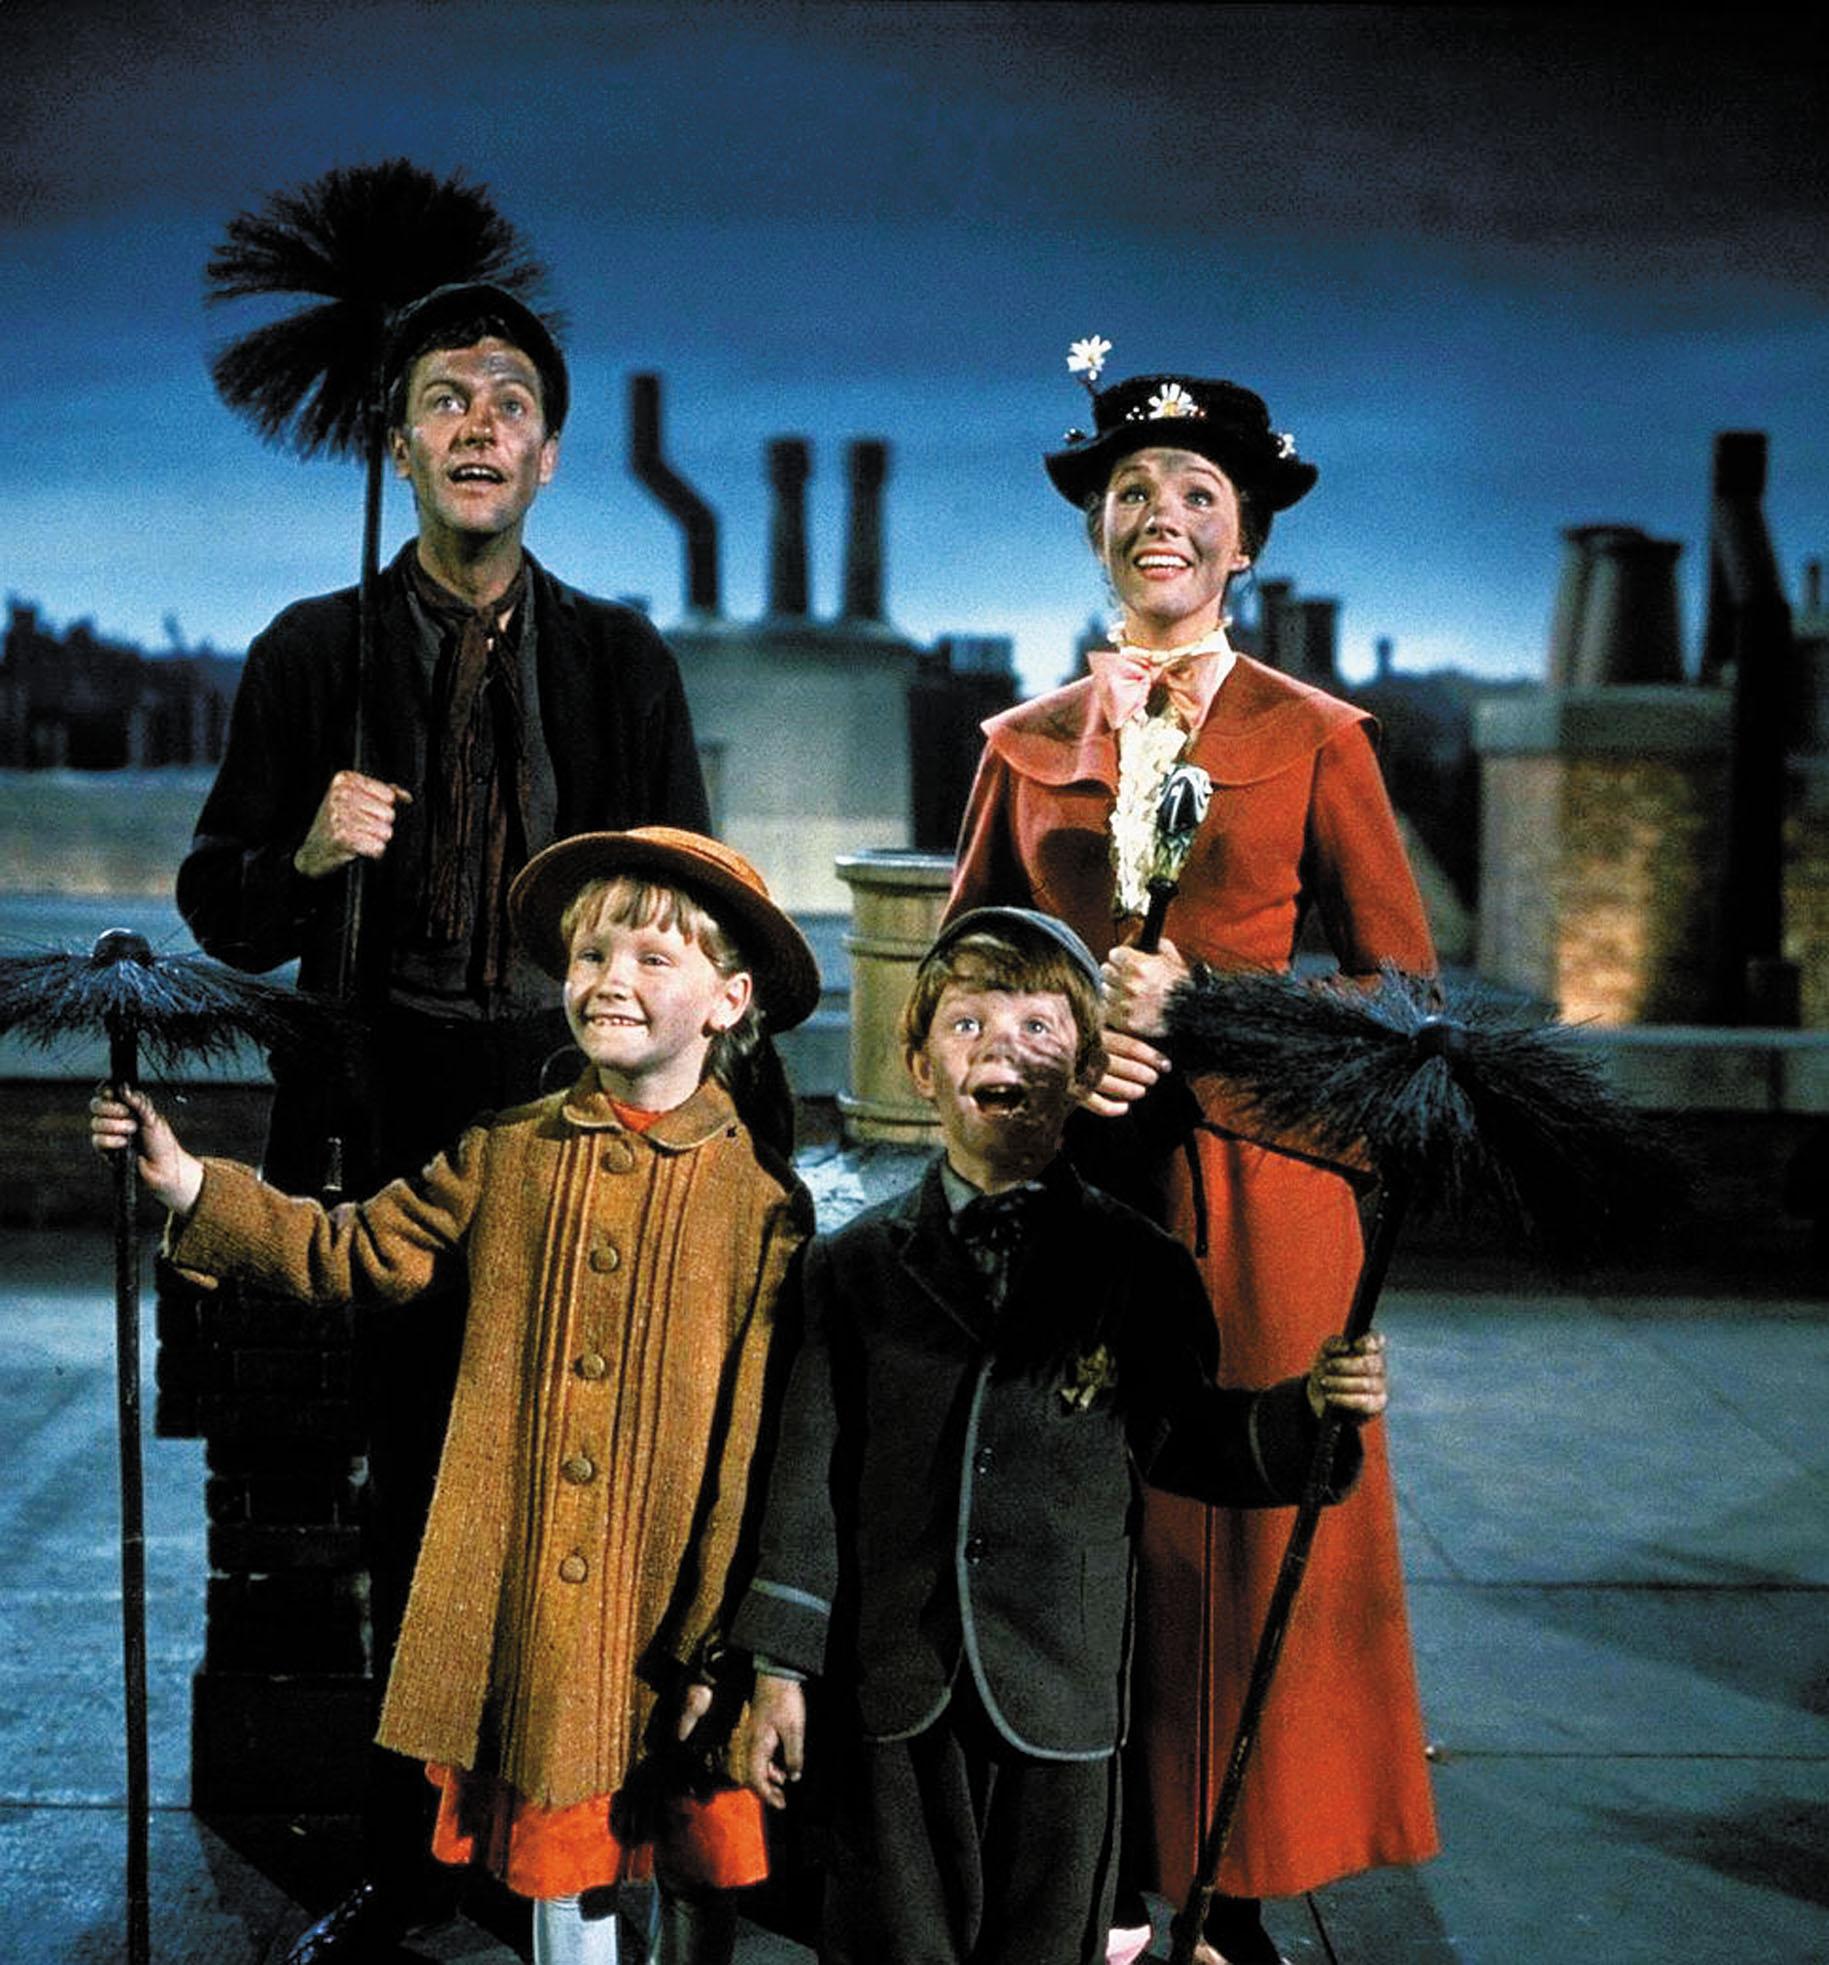 Mary Poppins (film version) - Liberapedia